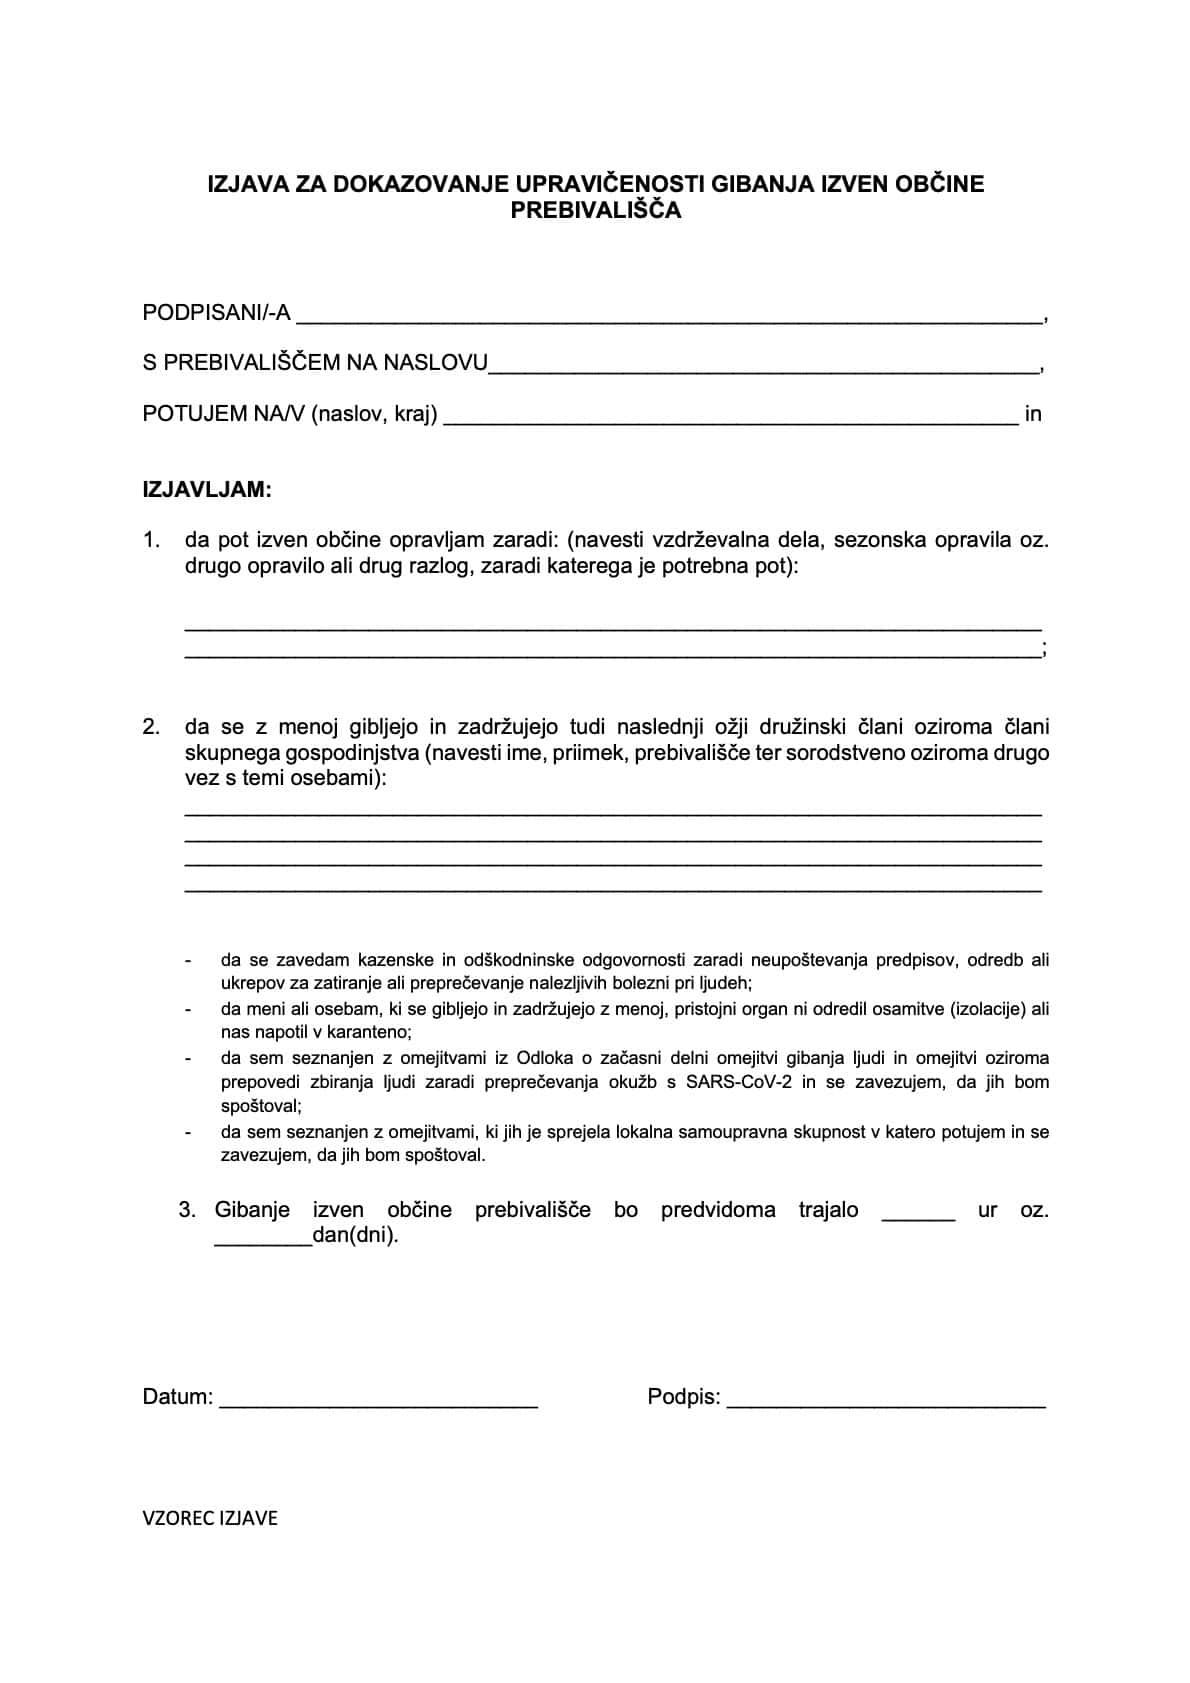 Vzorec Izjava za dokazovanje upravicenosti gibanja izven obcine prebivalisca